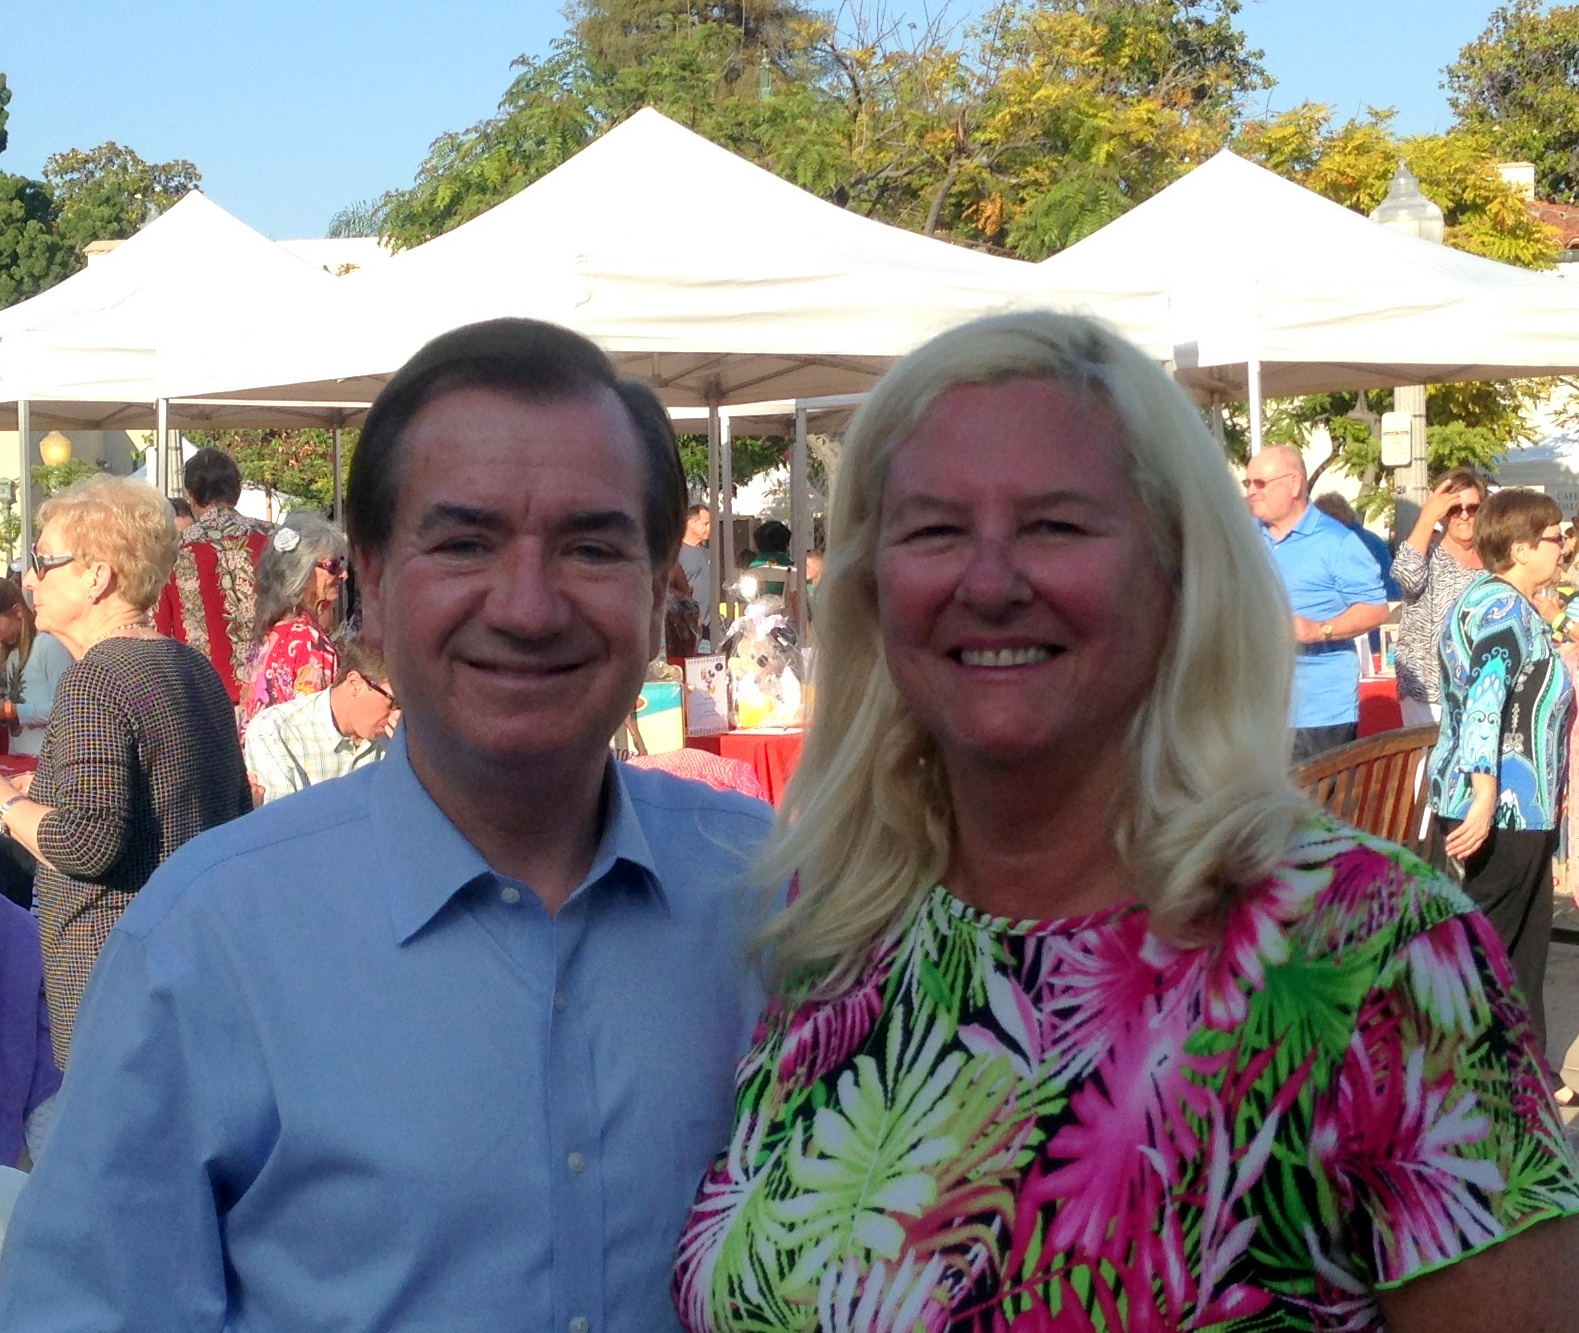 Karen Hathaway with congressman Ed Royce